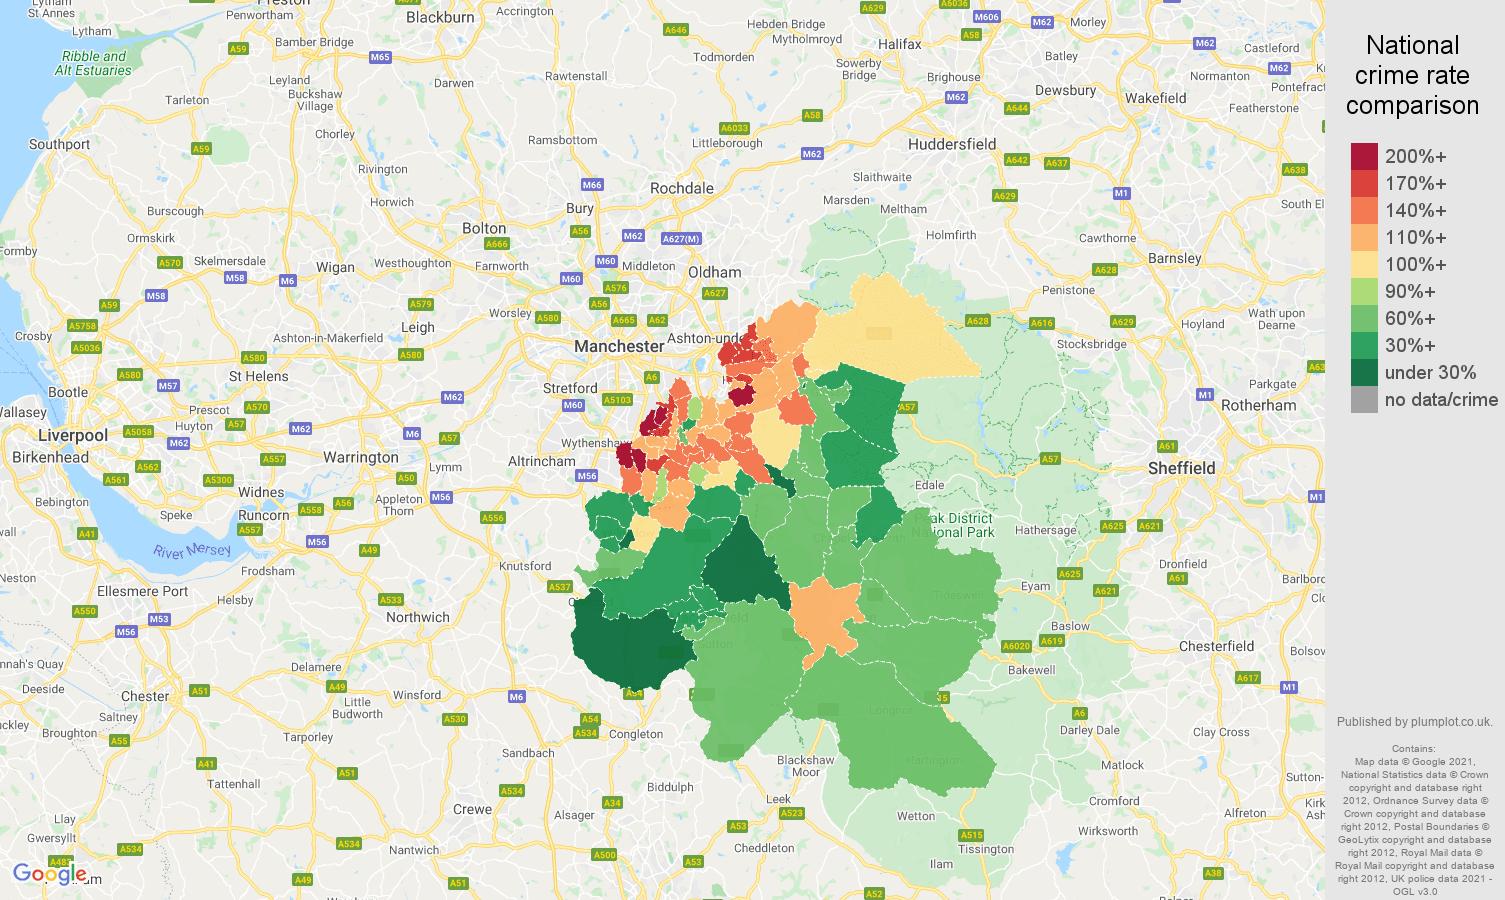 Stockport burglary crime rate comparison map